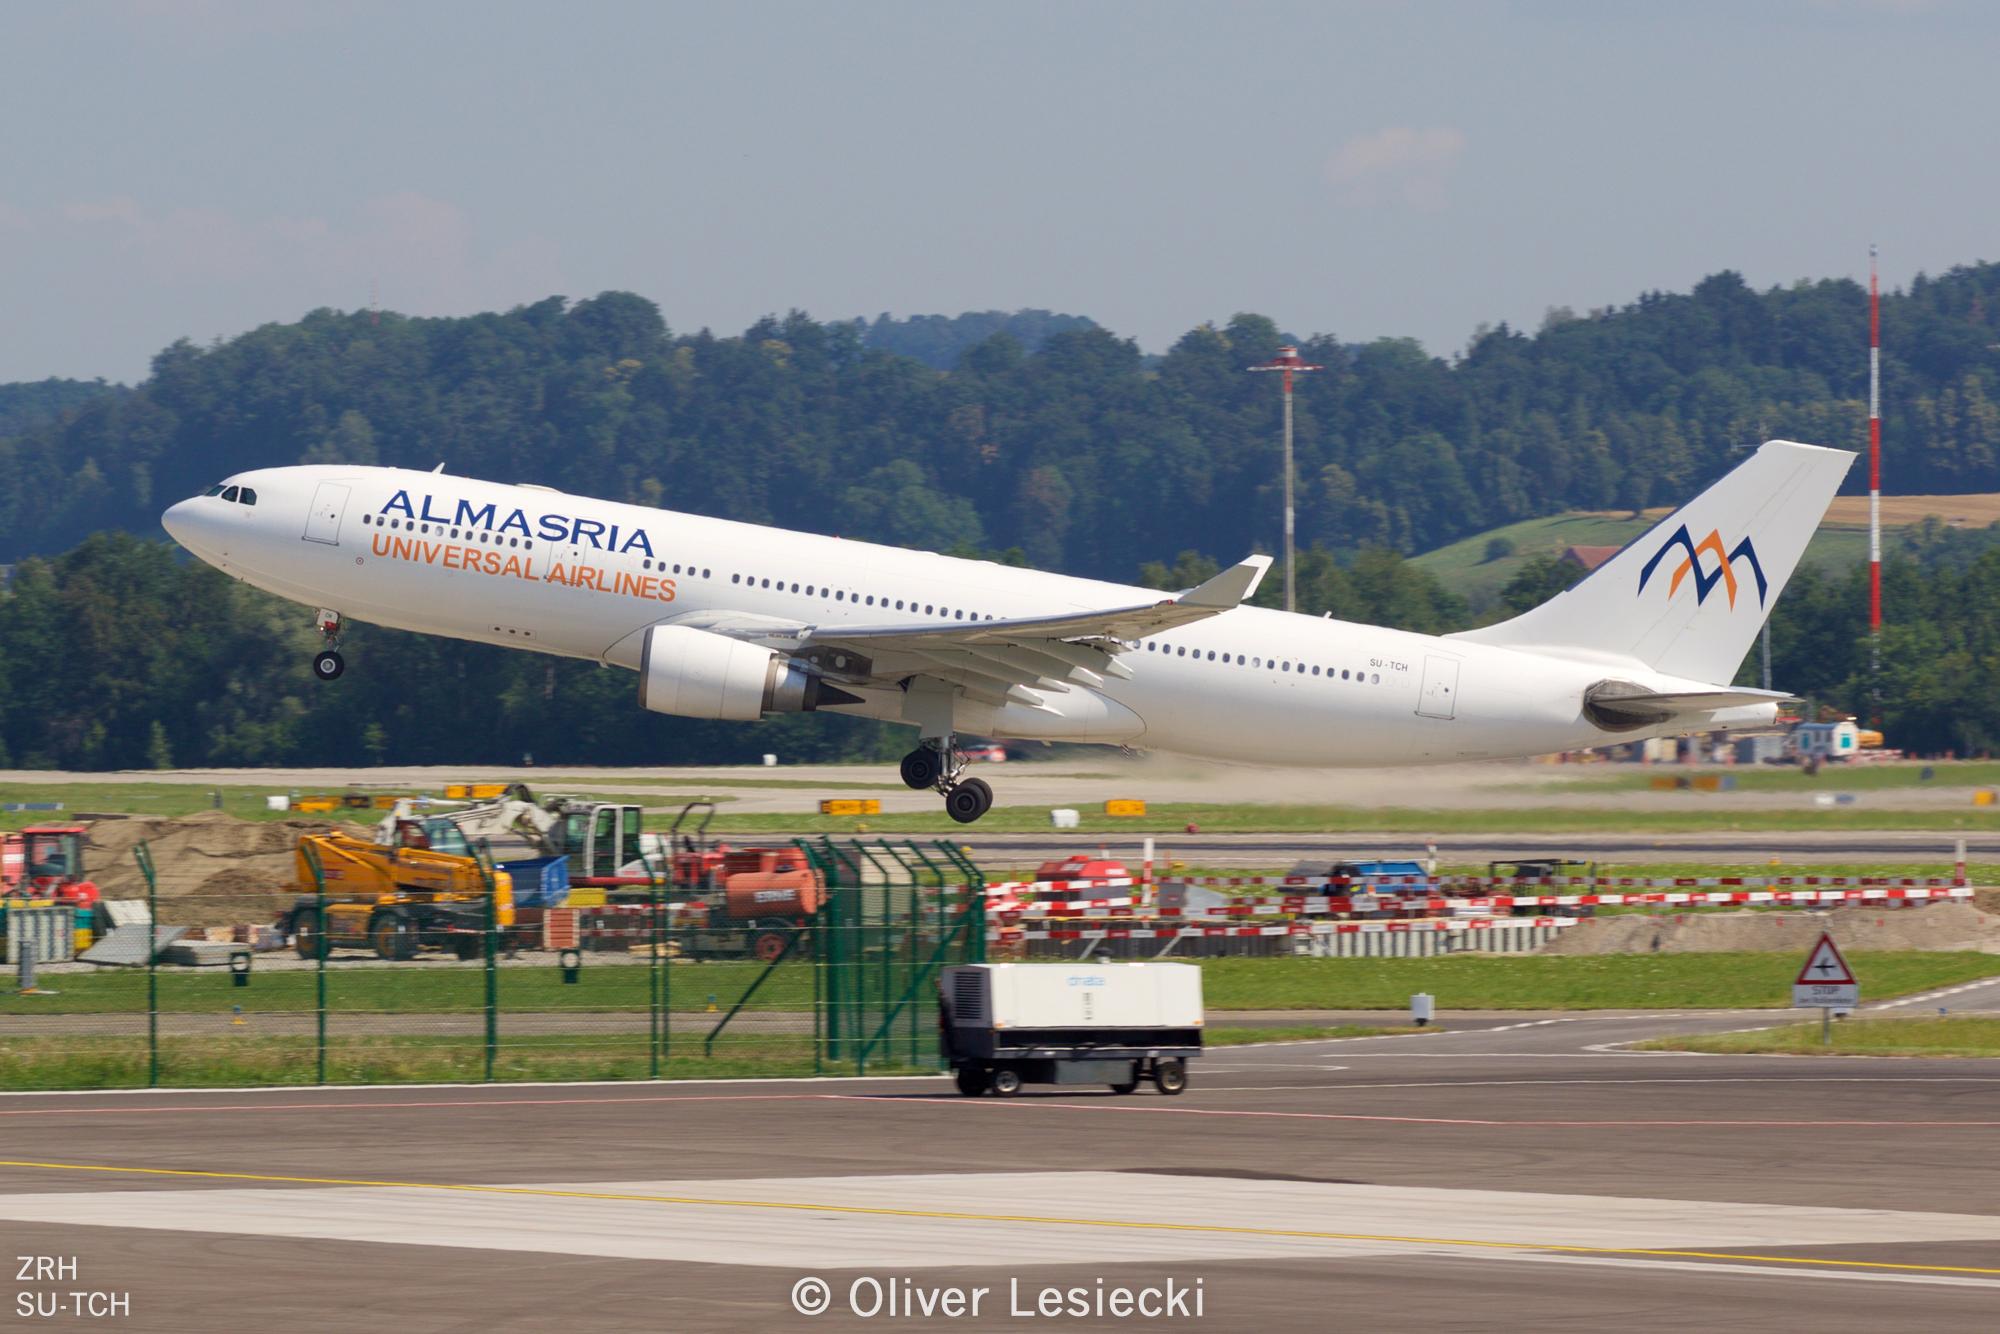 AlMasria_A330_SUTCH_05_ZRH_140718